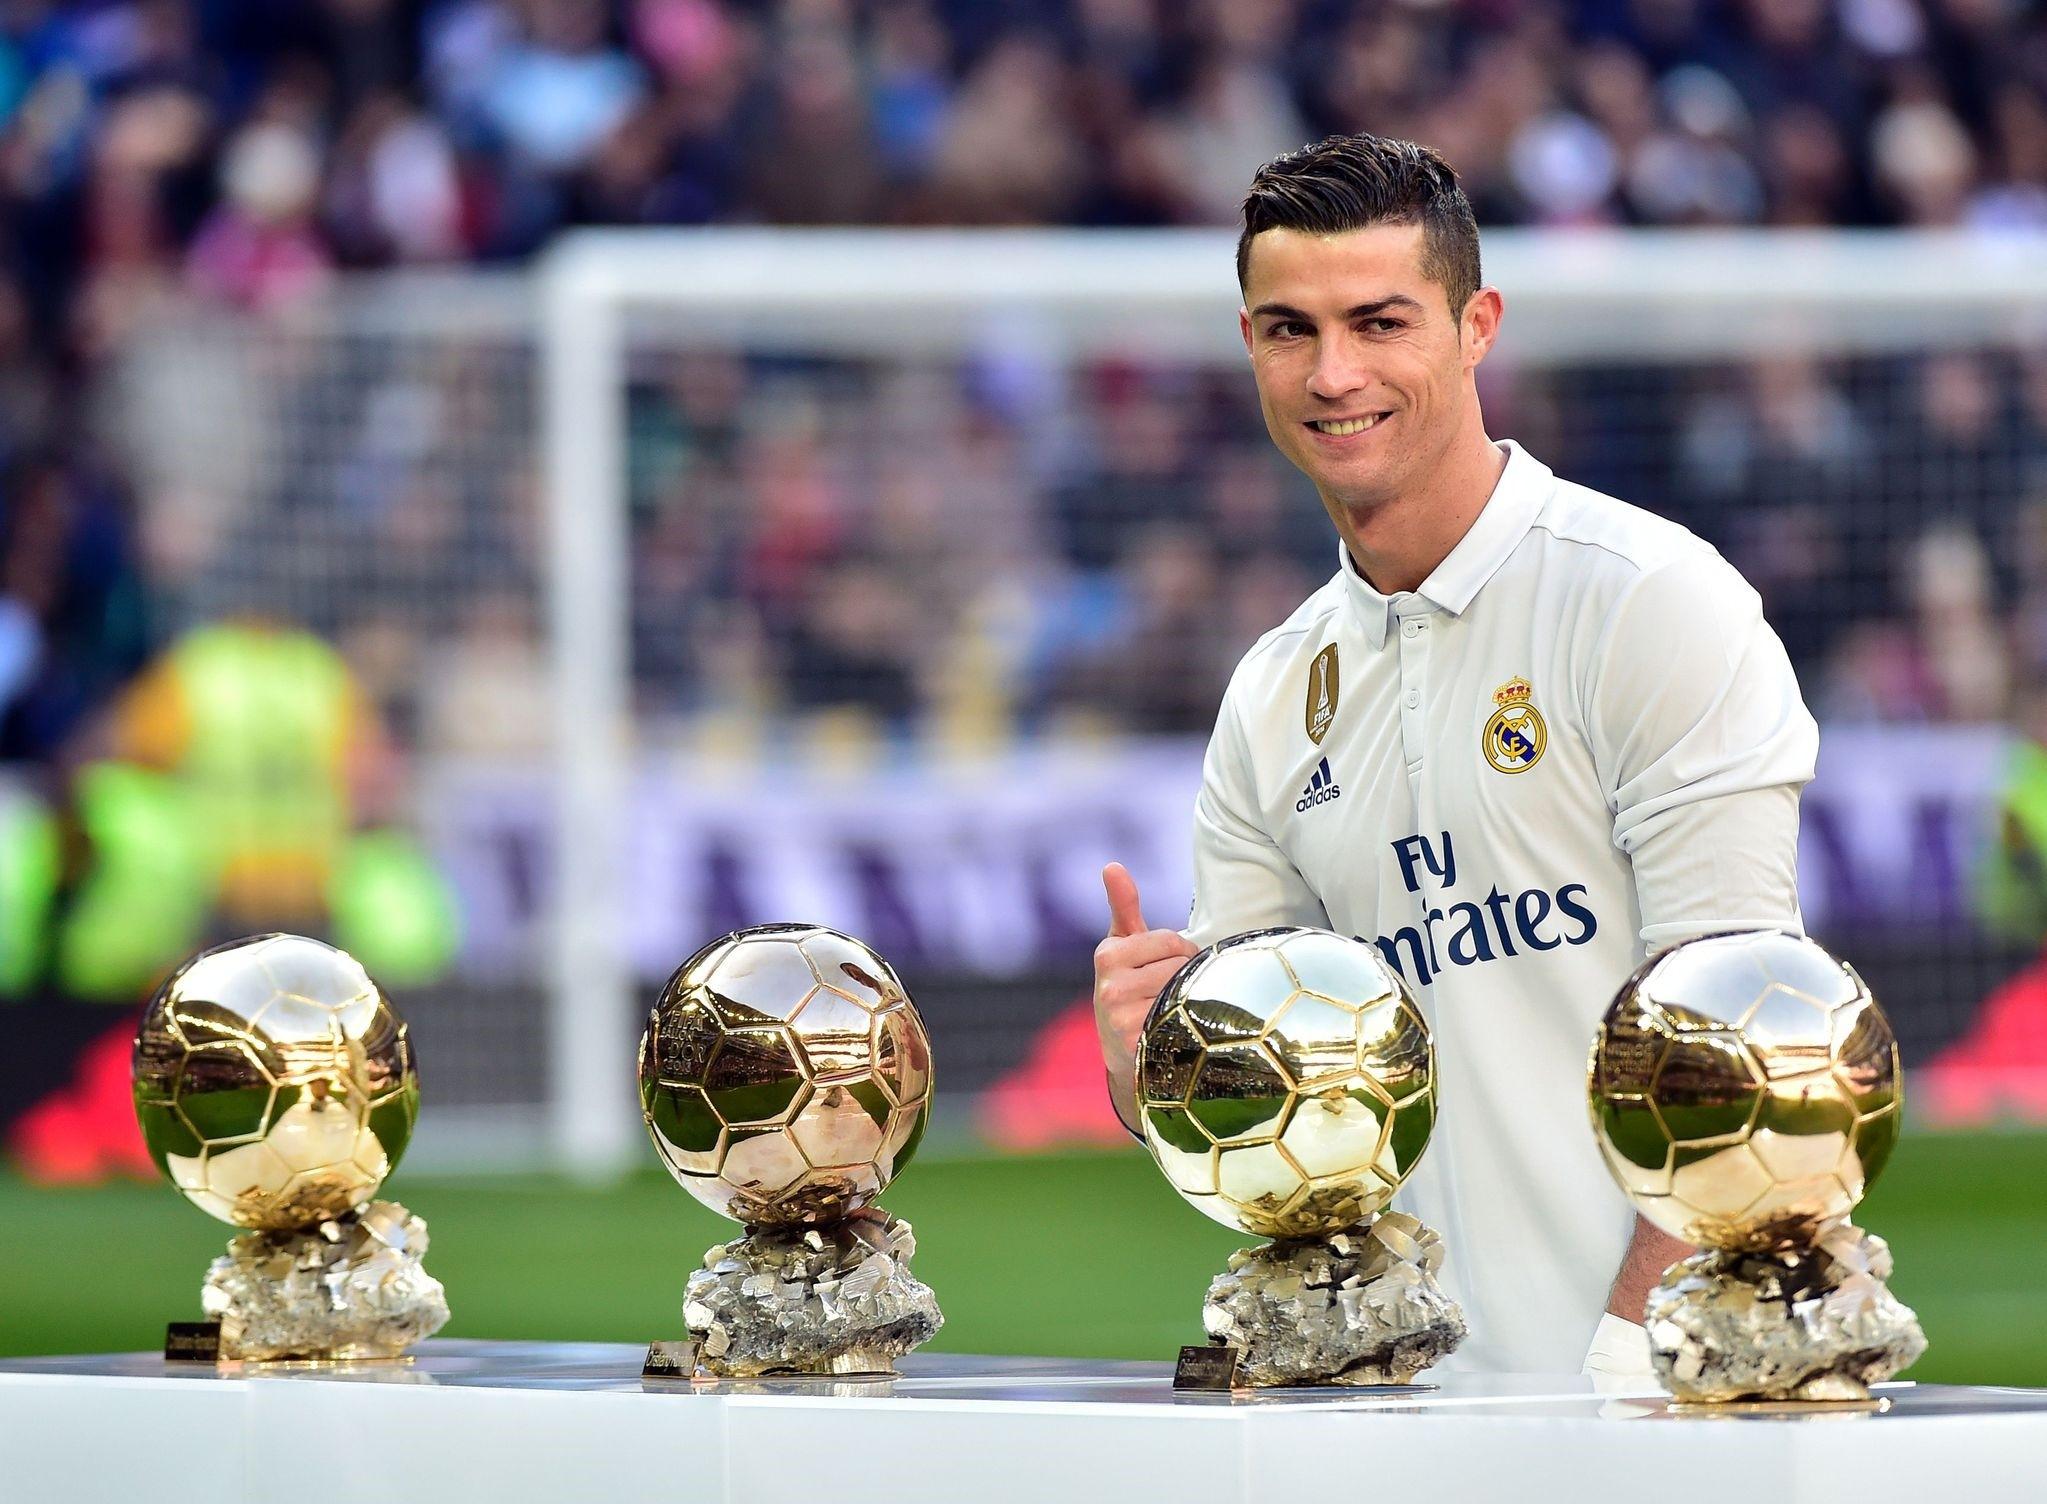 Real Madridu2019s Portuguese forward Cristiano Ronaldo poses with his four Ballon du2019Or France Football trophies before the Spanish league football match Real Madrid vs Granada at the Santiago Bernabeu stadium.